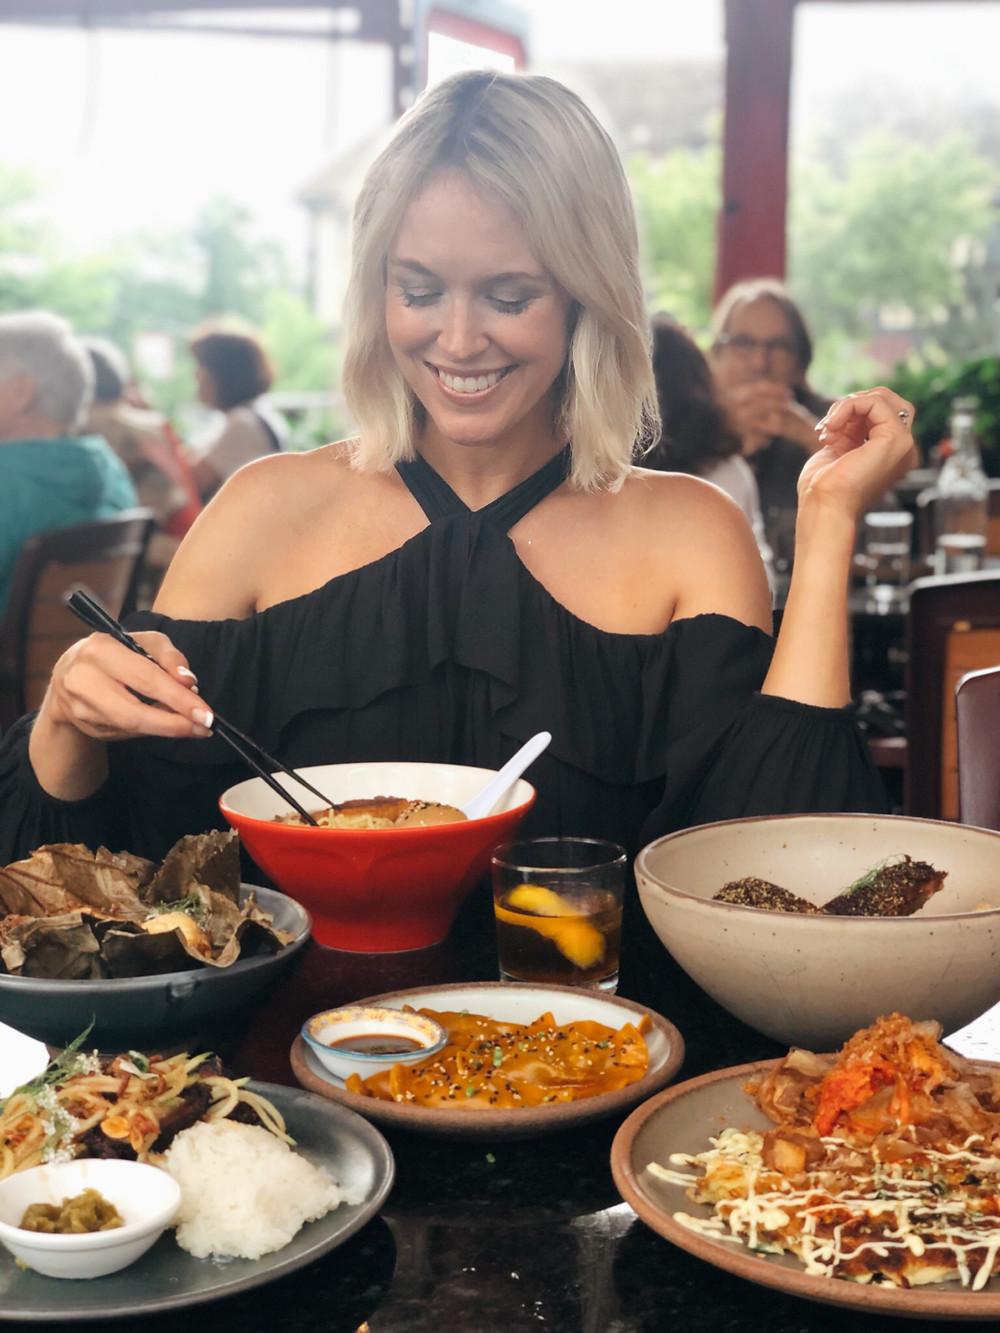 Gan Shan Station, Asheville restaurant, Asian food and fare, Visit Asheville, local favorite, best date night restaurant